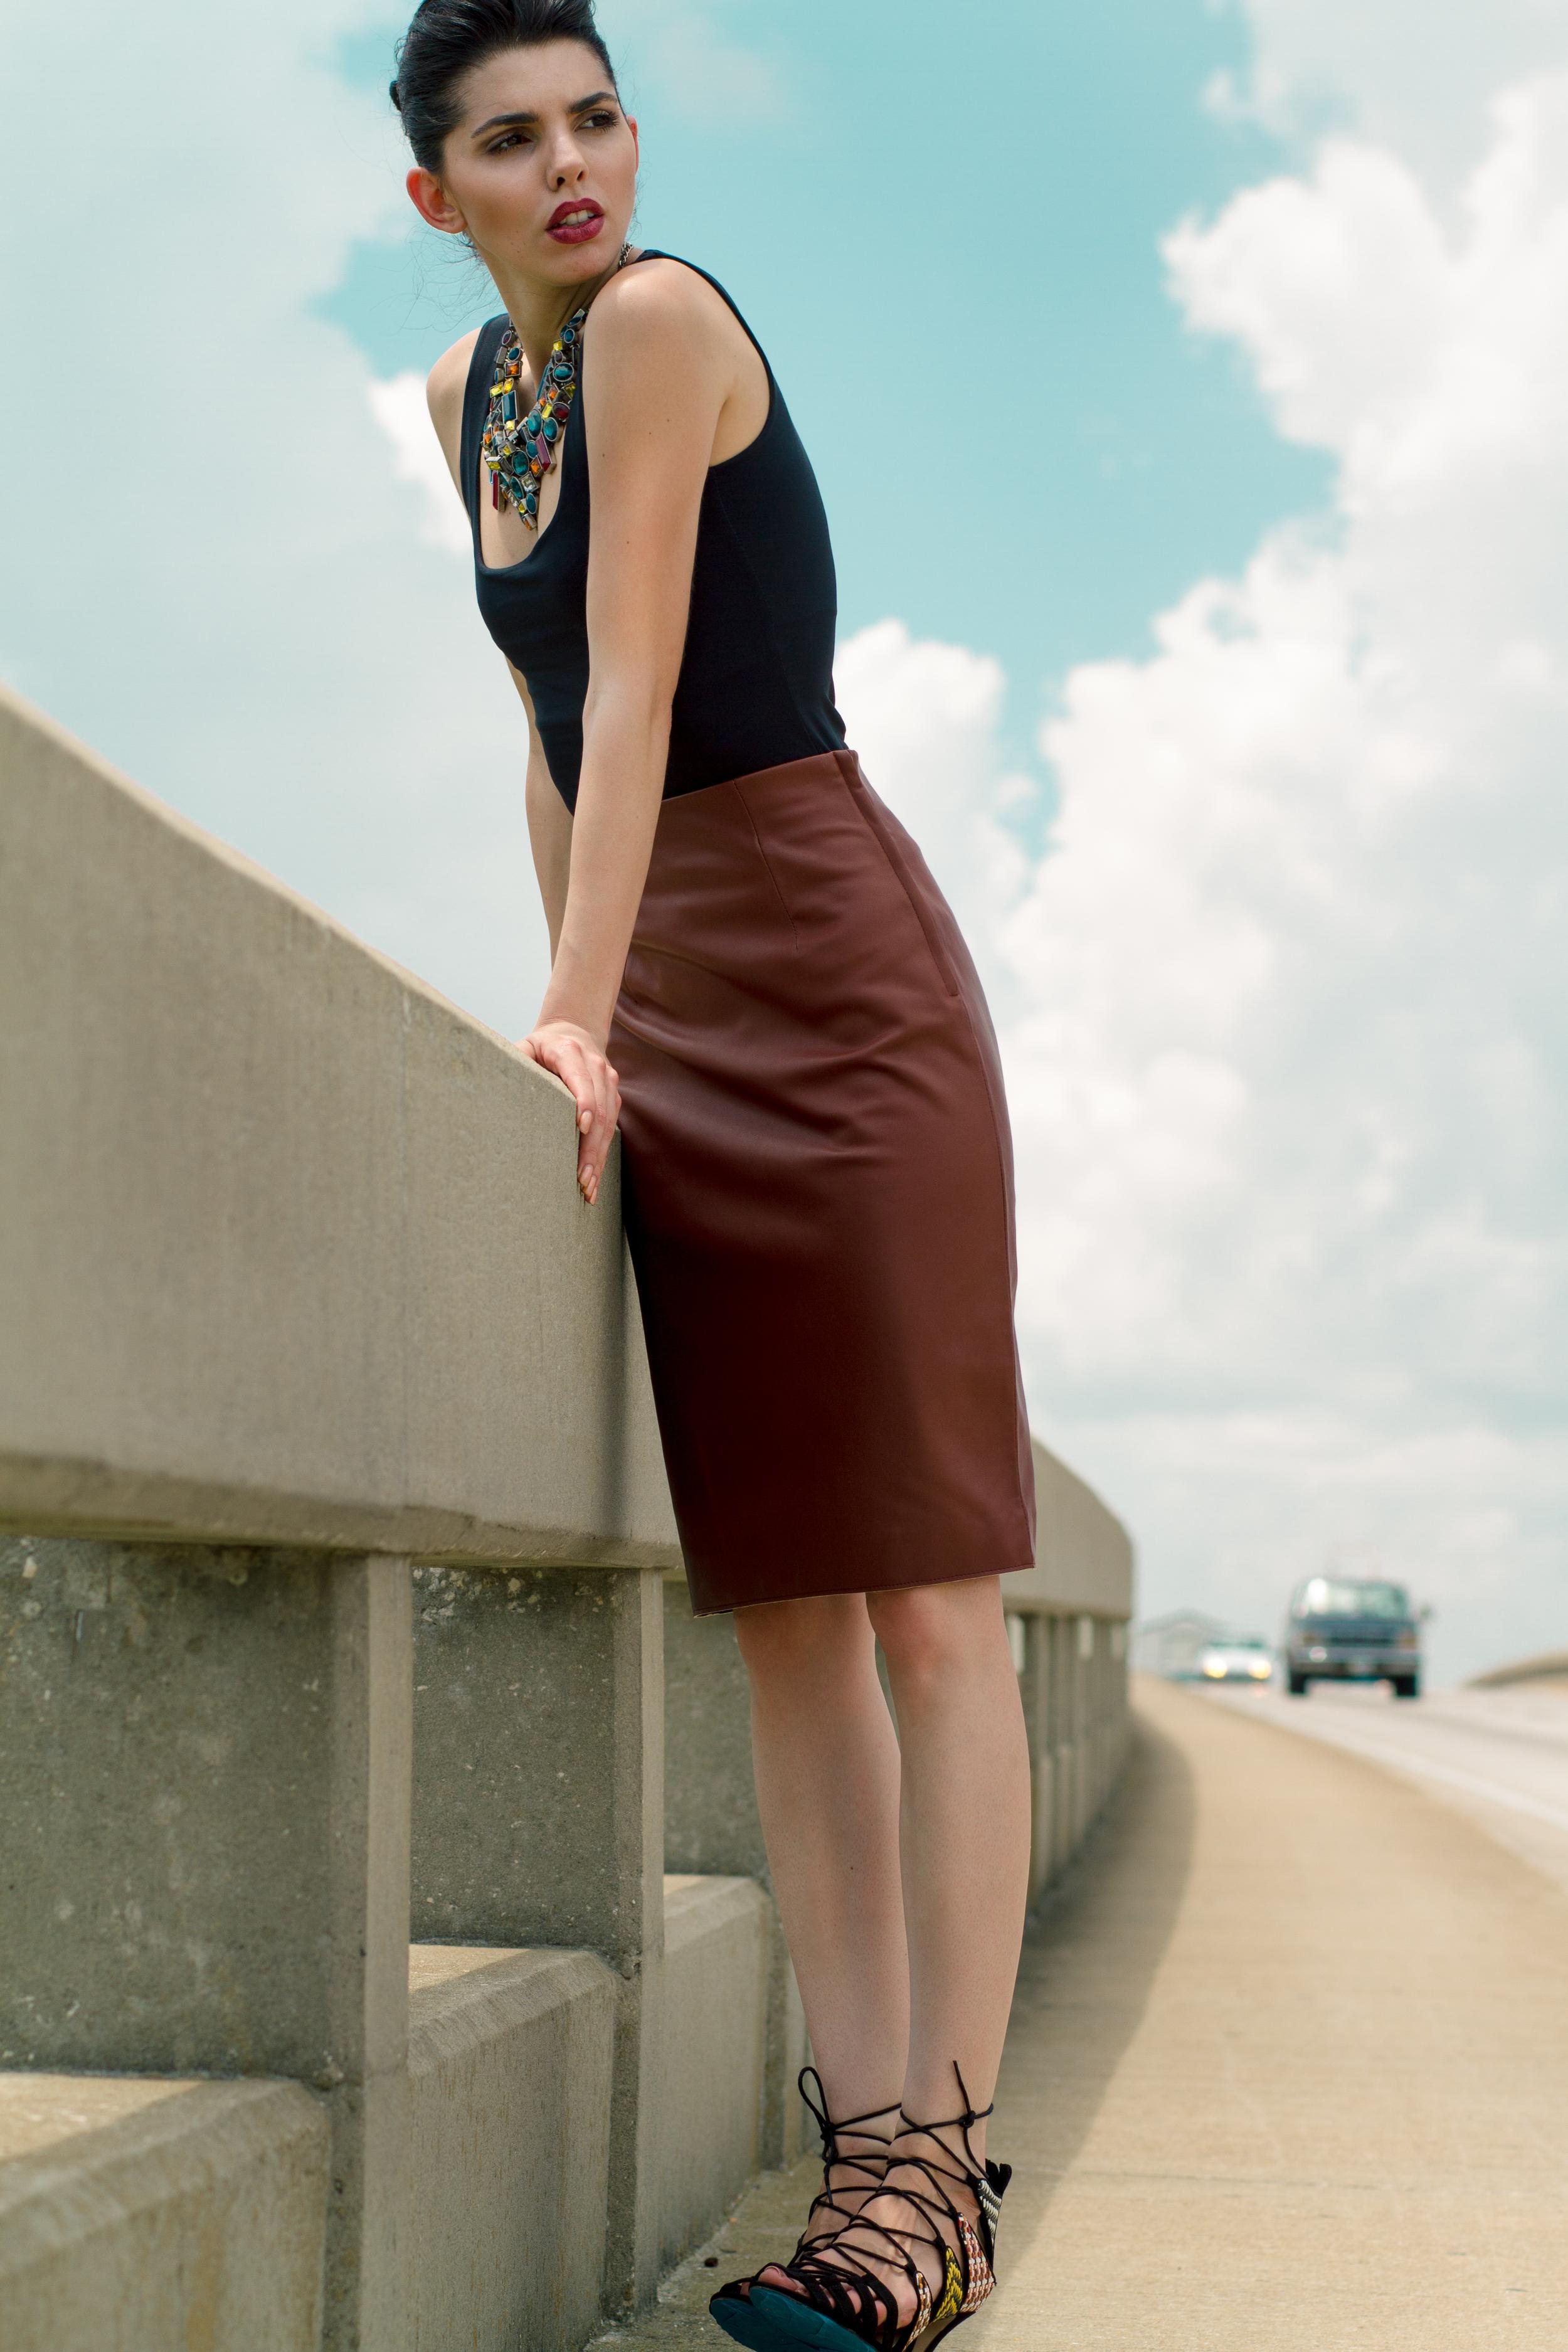 fashioneditorial_AlexisP_vaniaelise--11.jpg